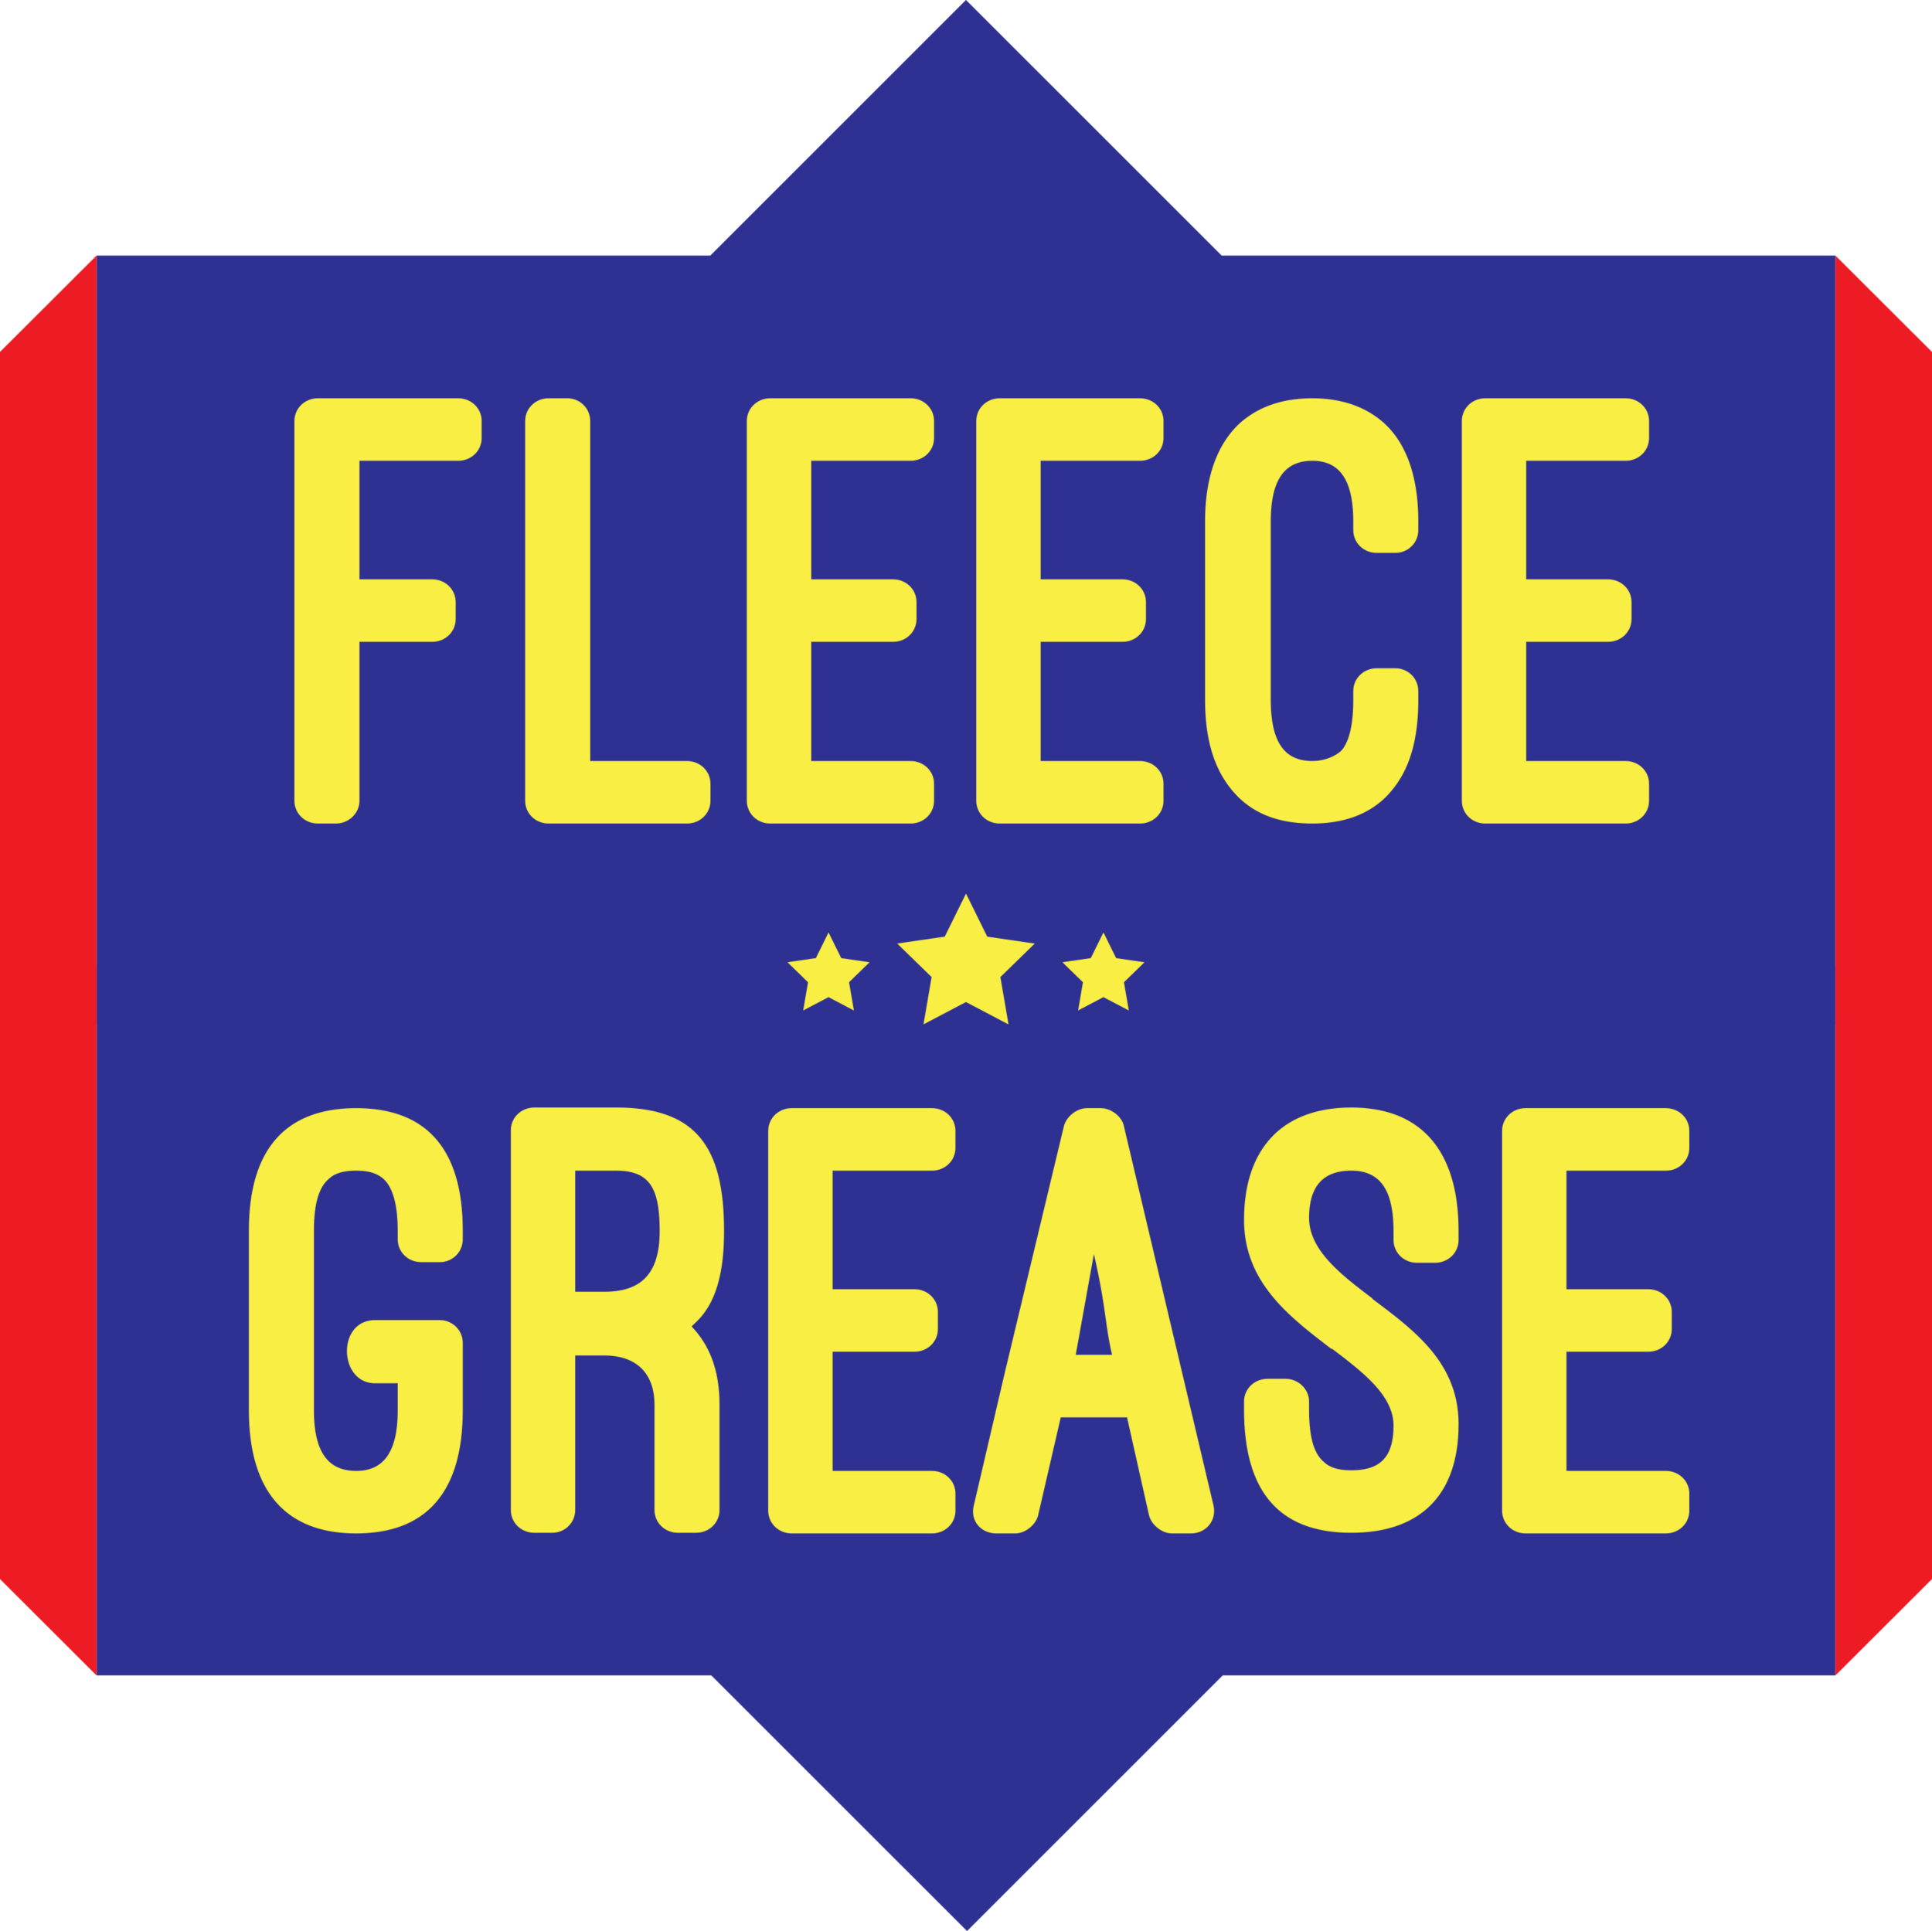 FLEECE GREASE.png